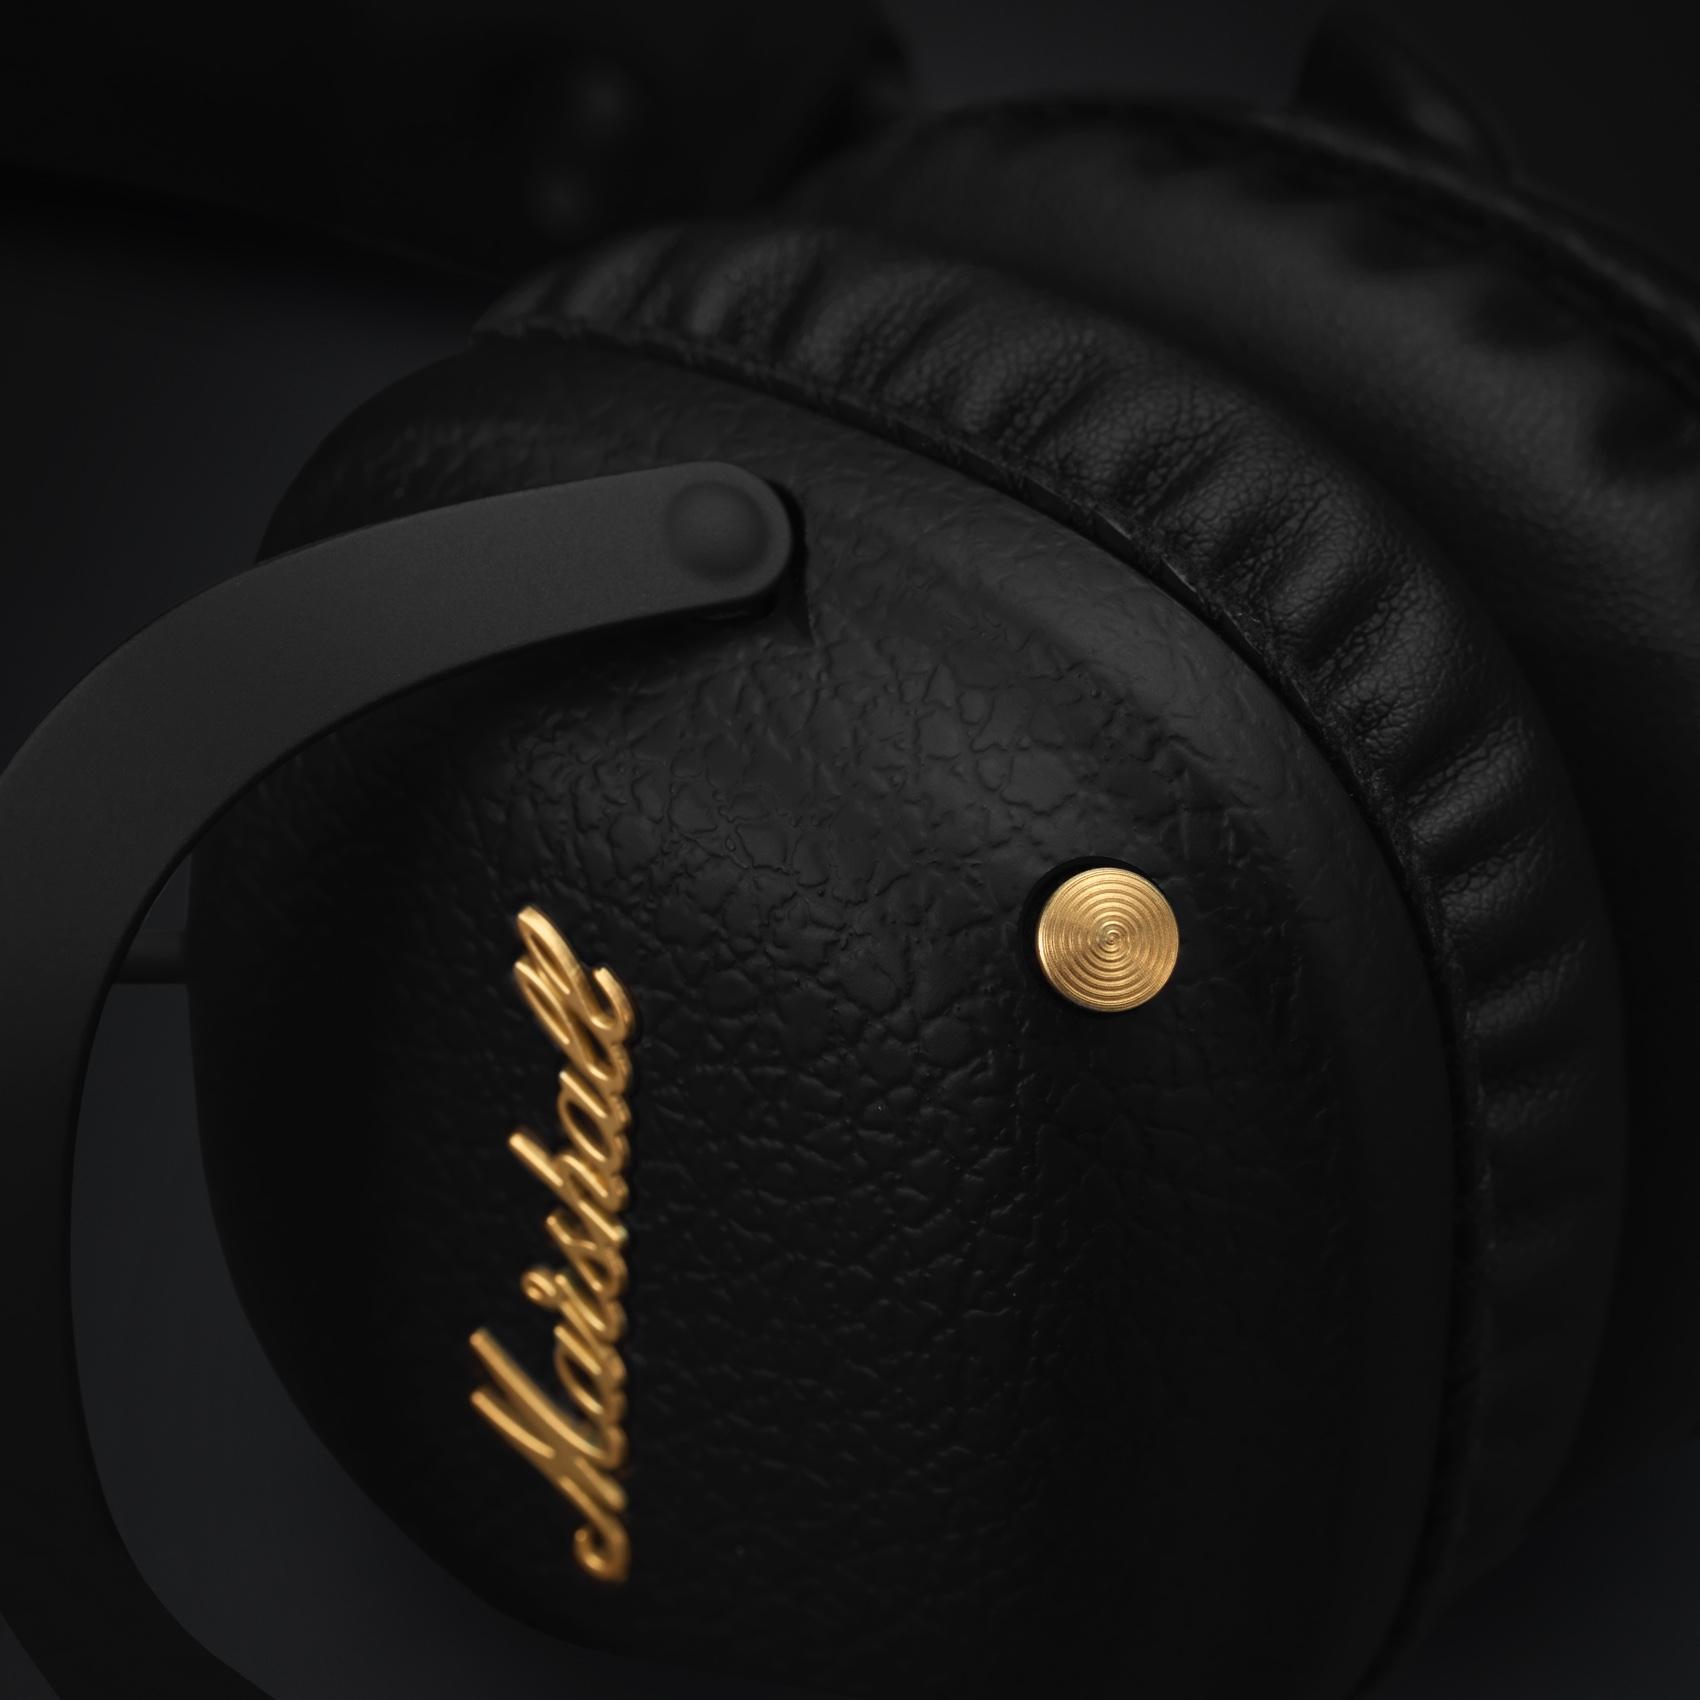 Marshall Mid A.N.C Wireless On-Ear Headphones